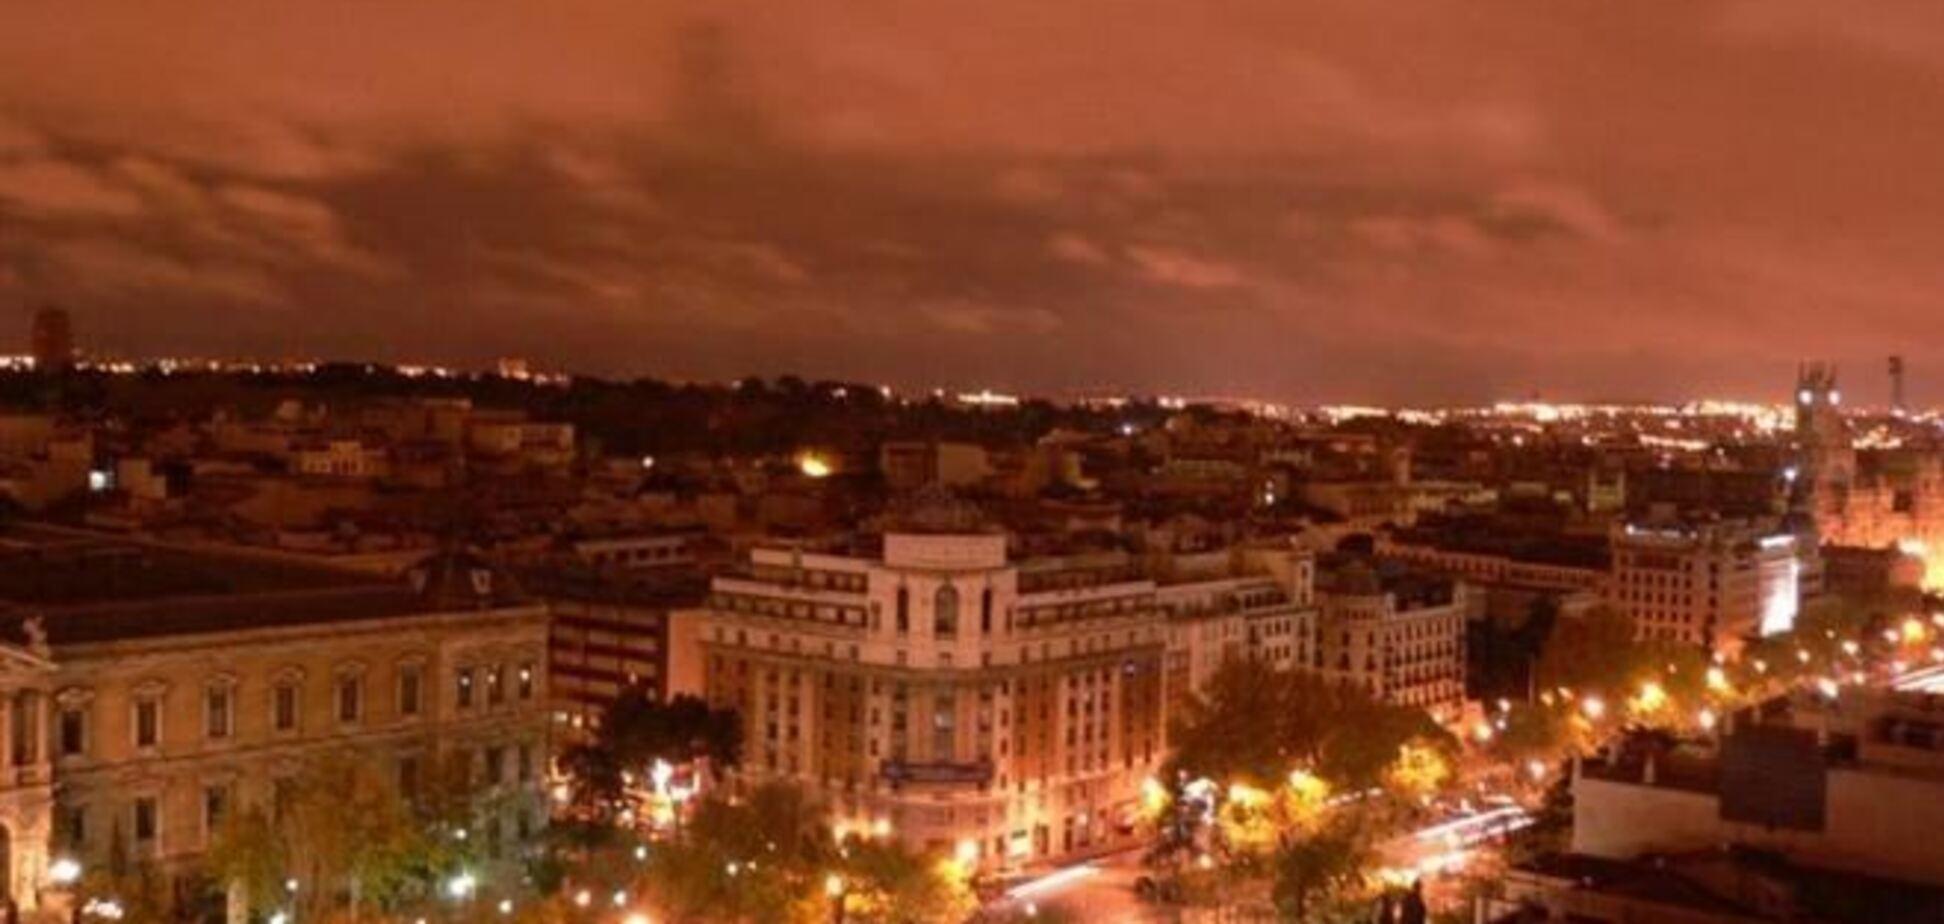 ING Direct предложил ипотеку покупателям недвижимости испанского 'плохого' банка